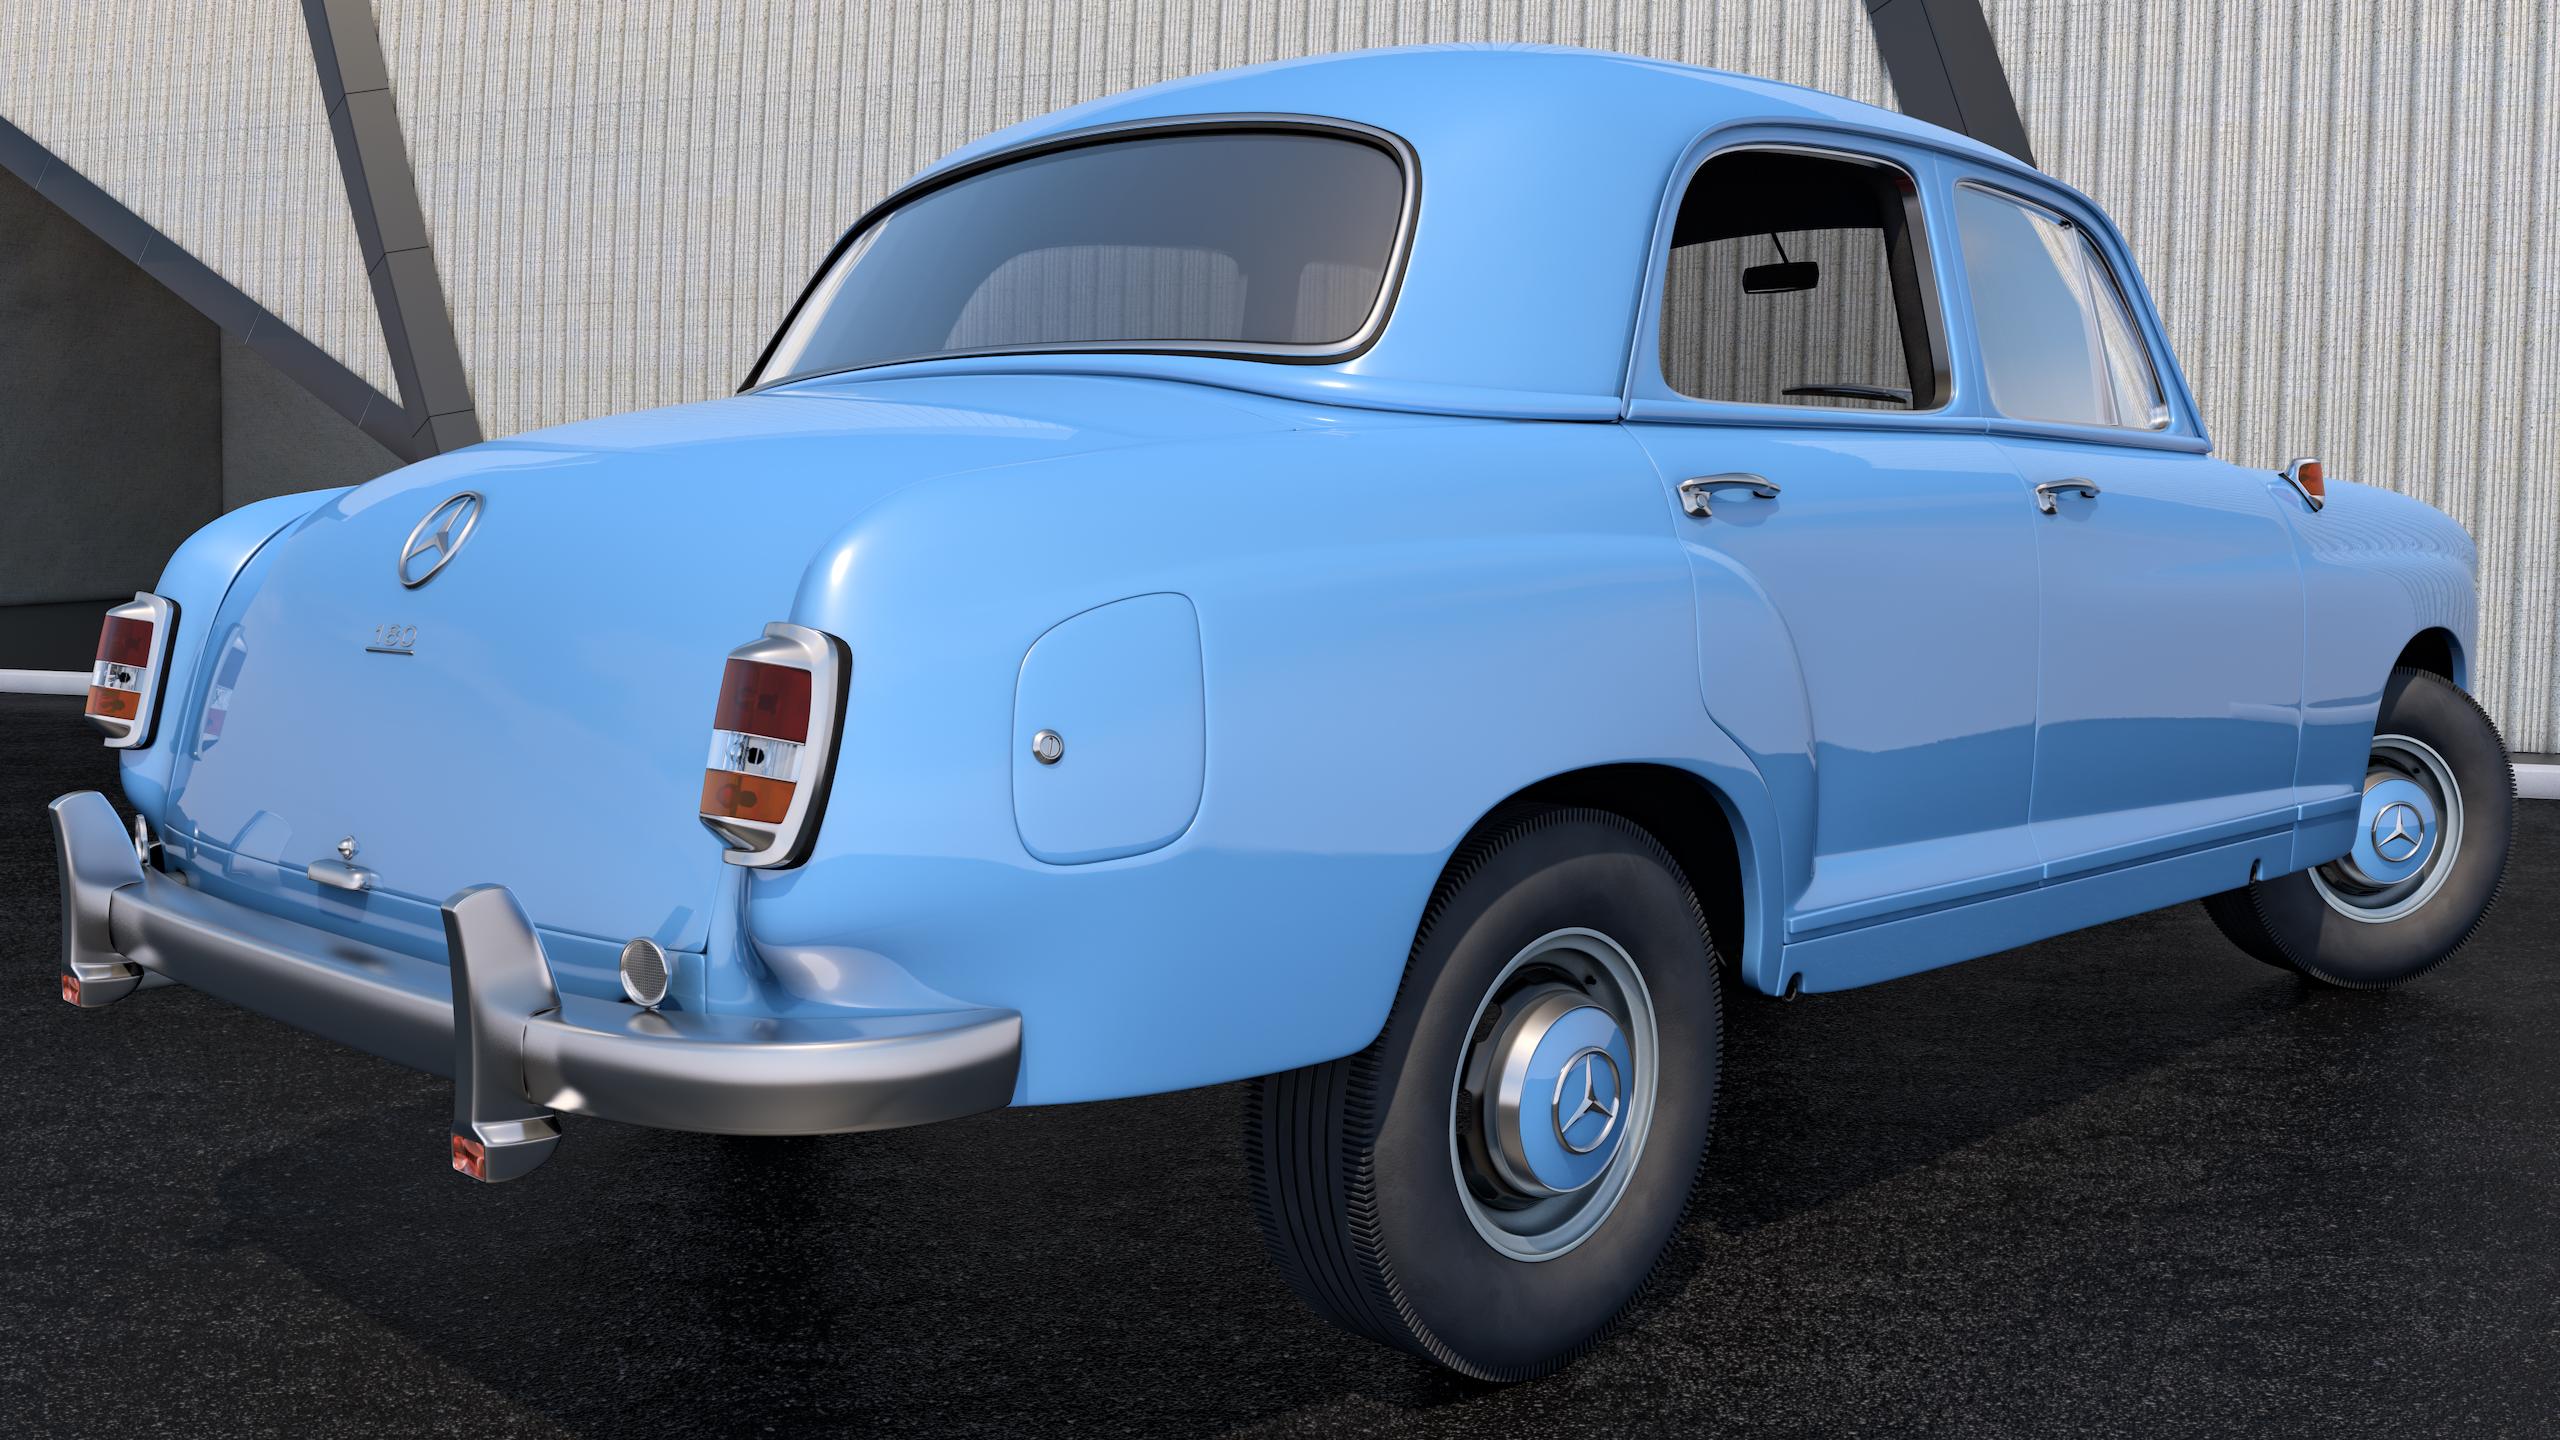 1953 mercedes benz 180 by samcurry on deviantart for 1953 mercedes benz